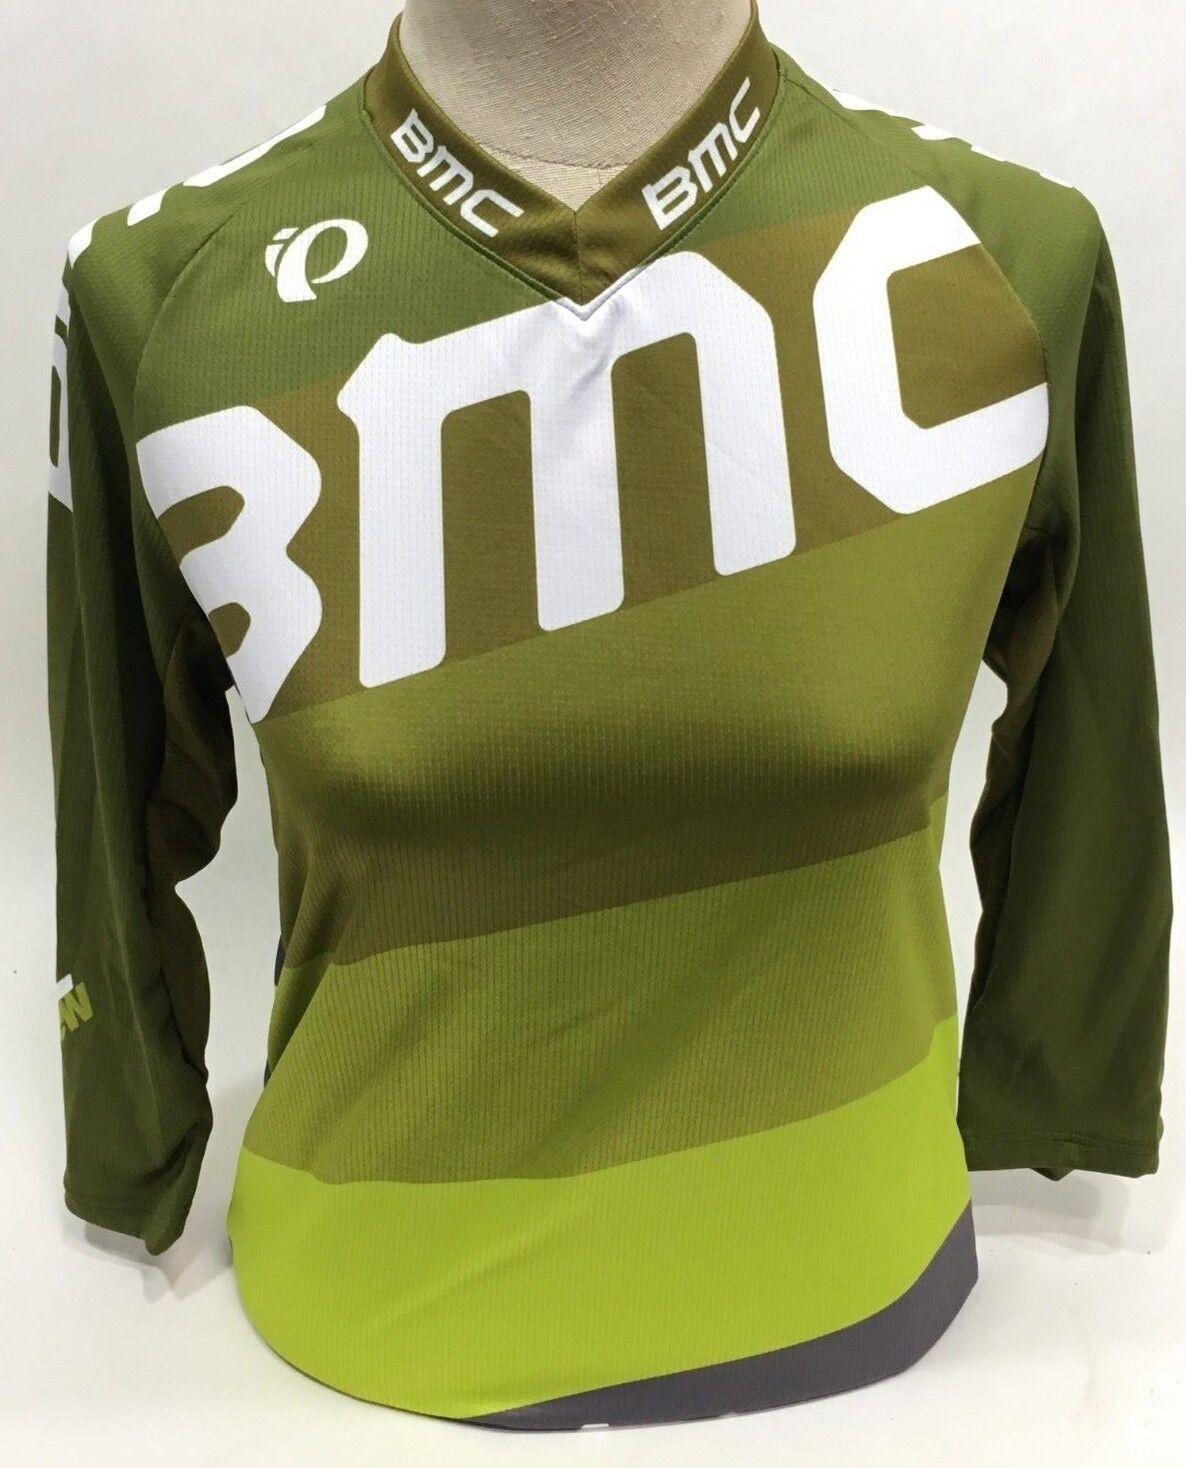 Pearl Izumi BMC Trailcrew Mountainbike Trikot Weit Limone Damen - L - 215446